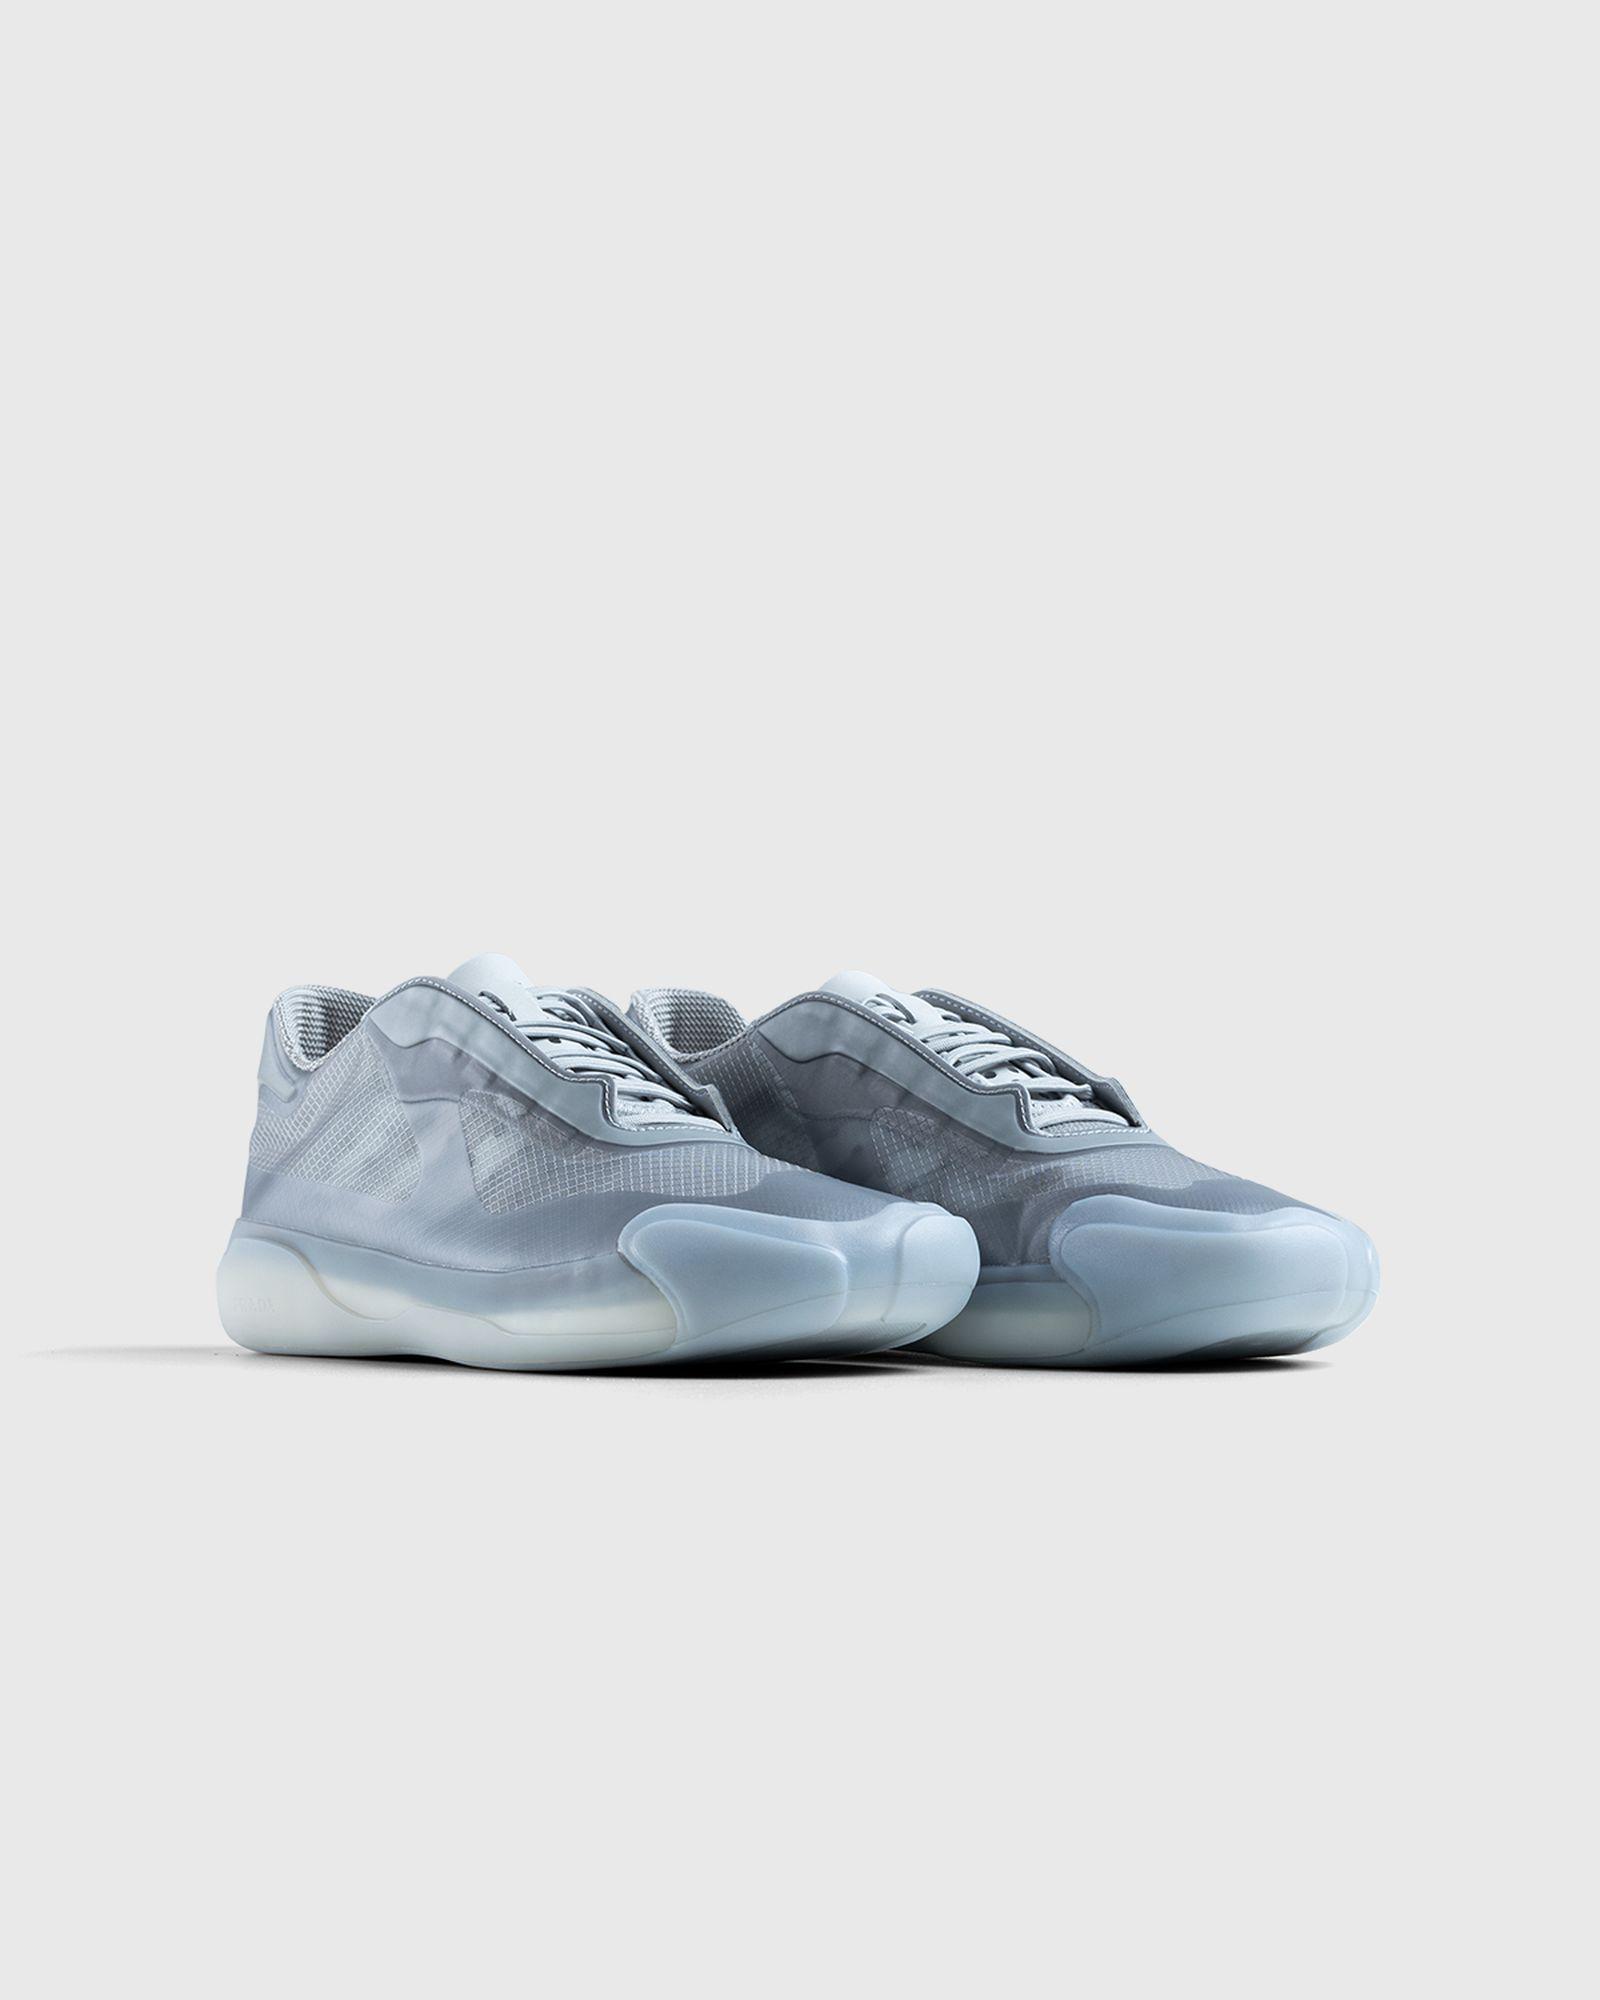 adidas-prada-luna-rossa-replica-grey-release-date-price-2